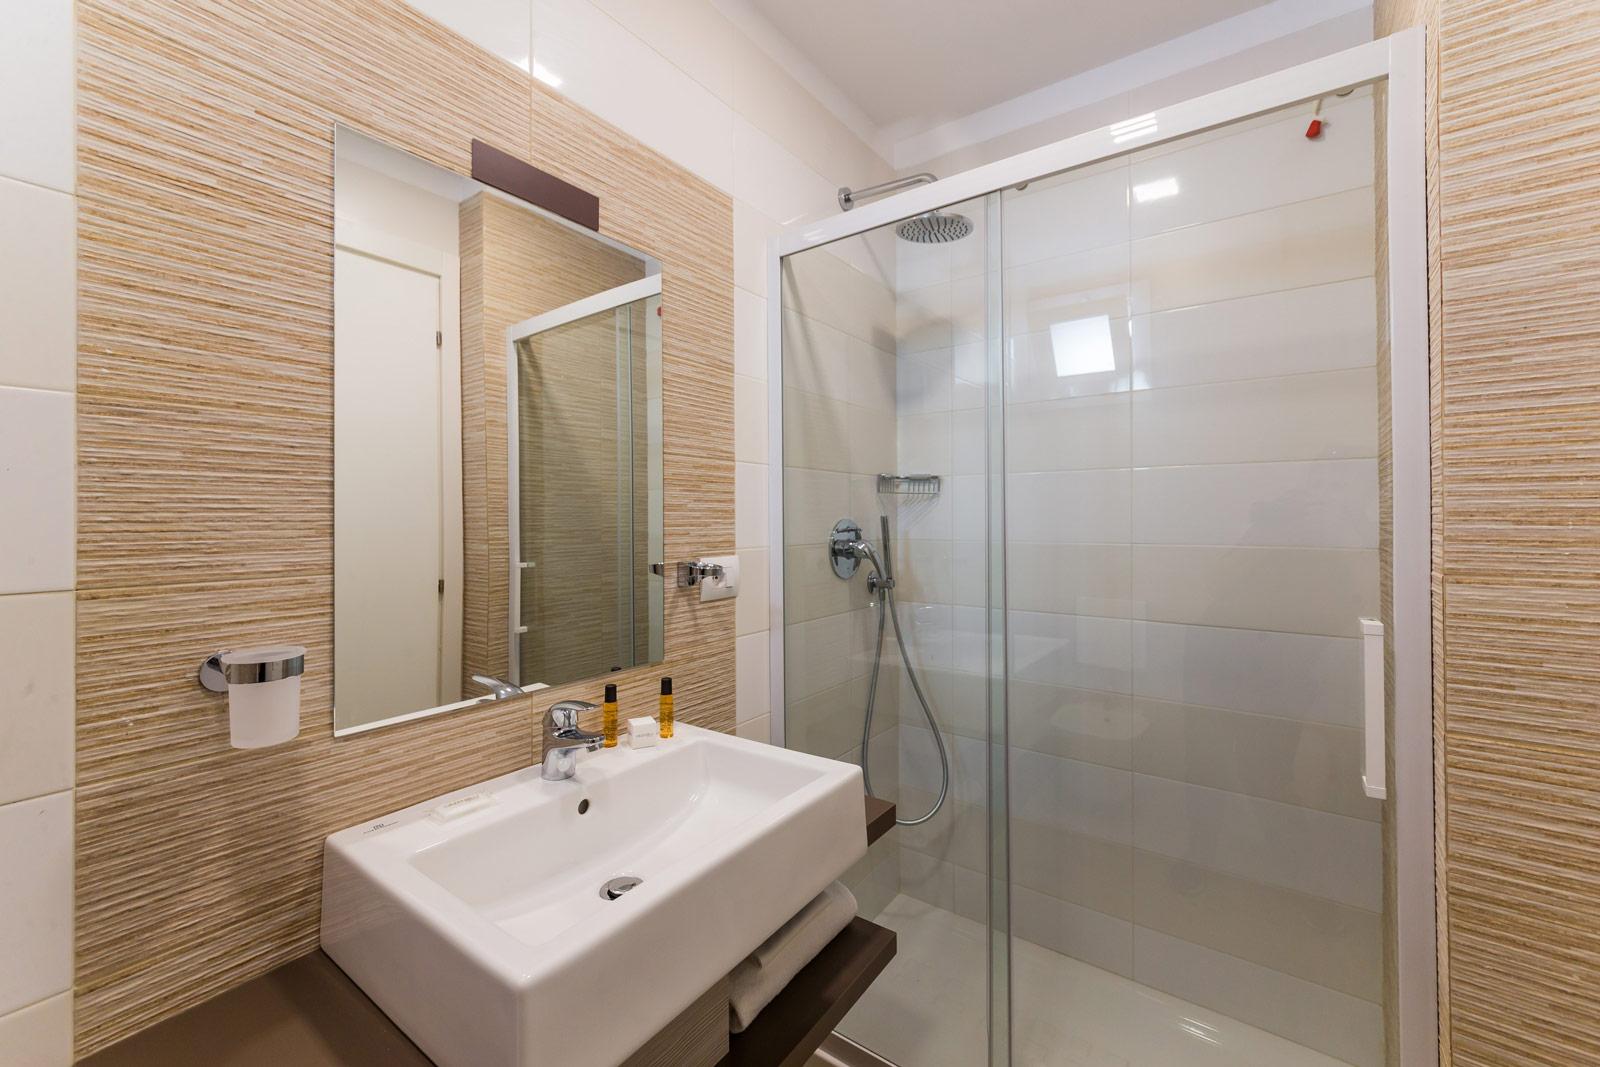 Bathroom at Torre Cintola